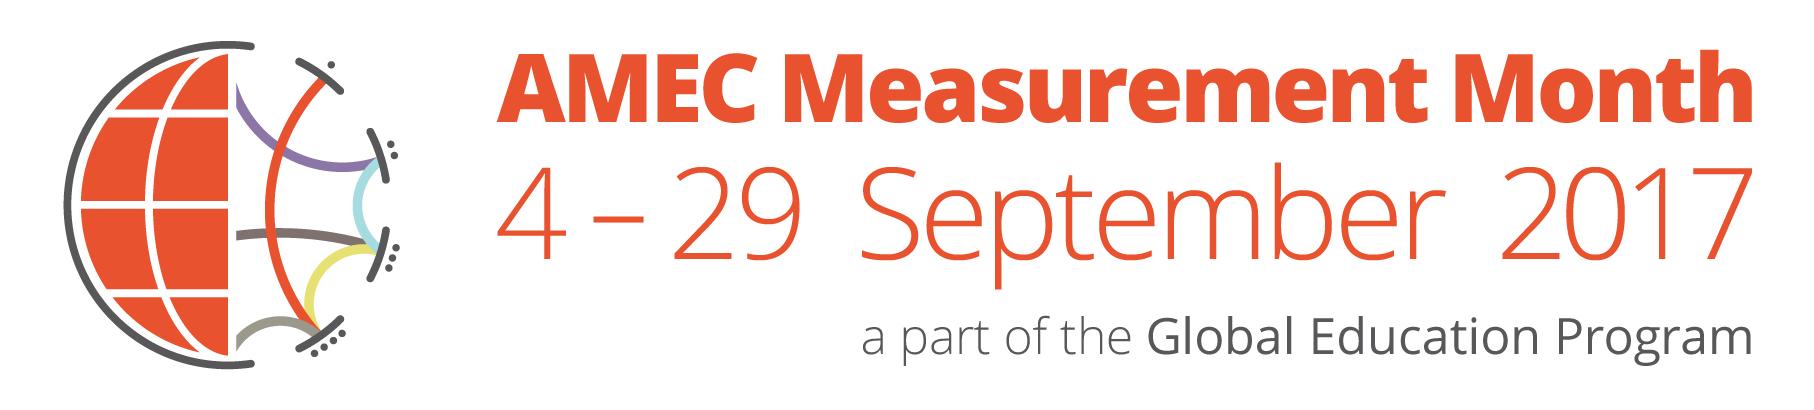 AMEC Measurement Month 2017